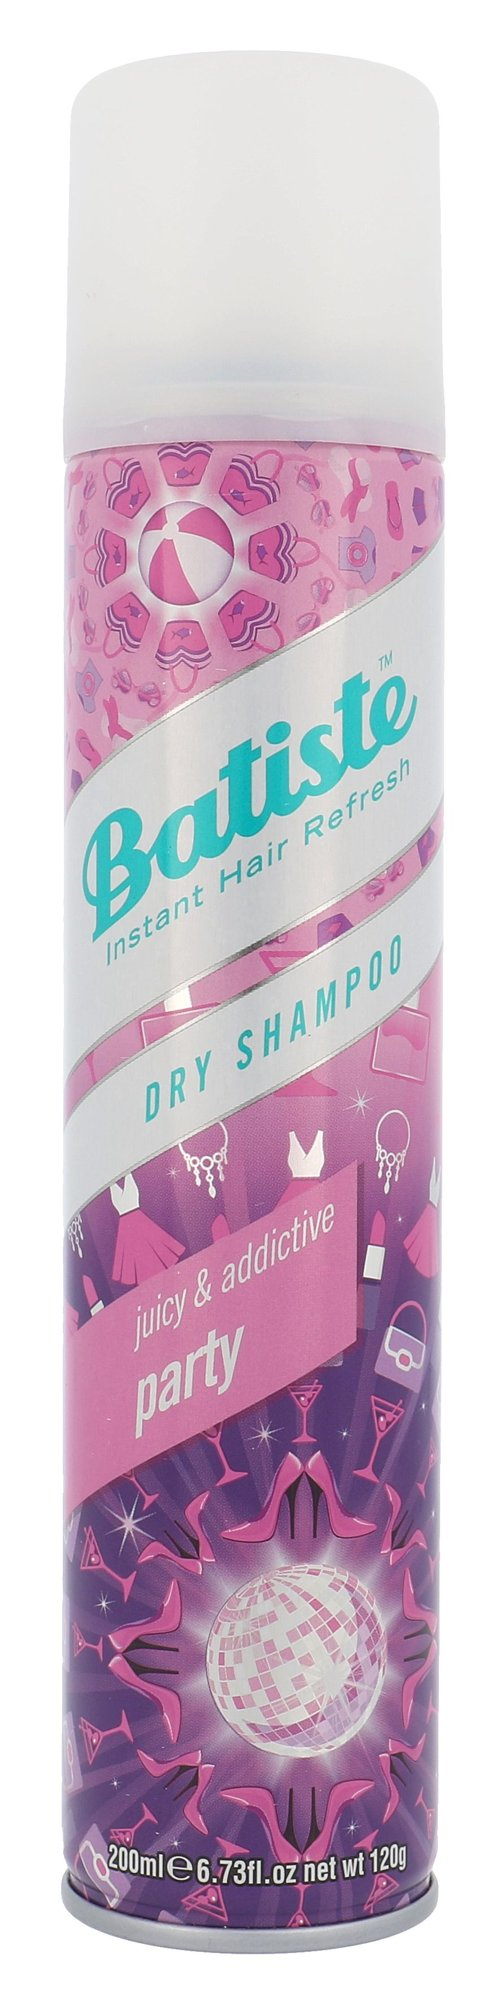 Batiste Party Cosmetic 200ml